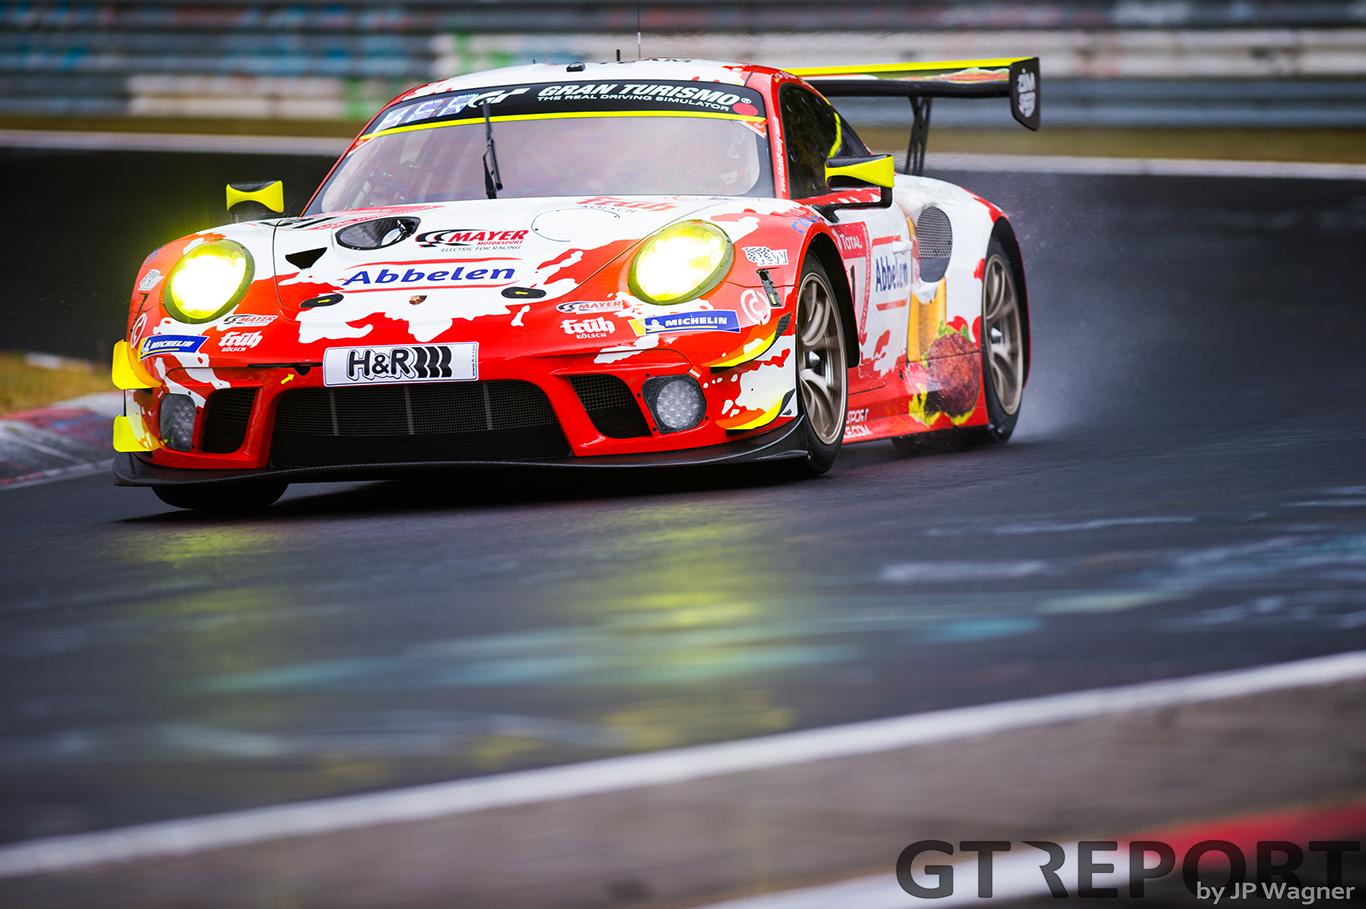 Nürburgring 24 Hours driver report: Lars Kern – Qualifying